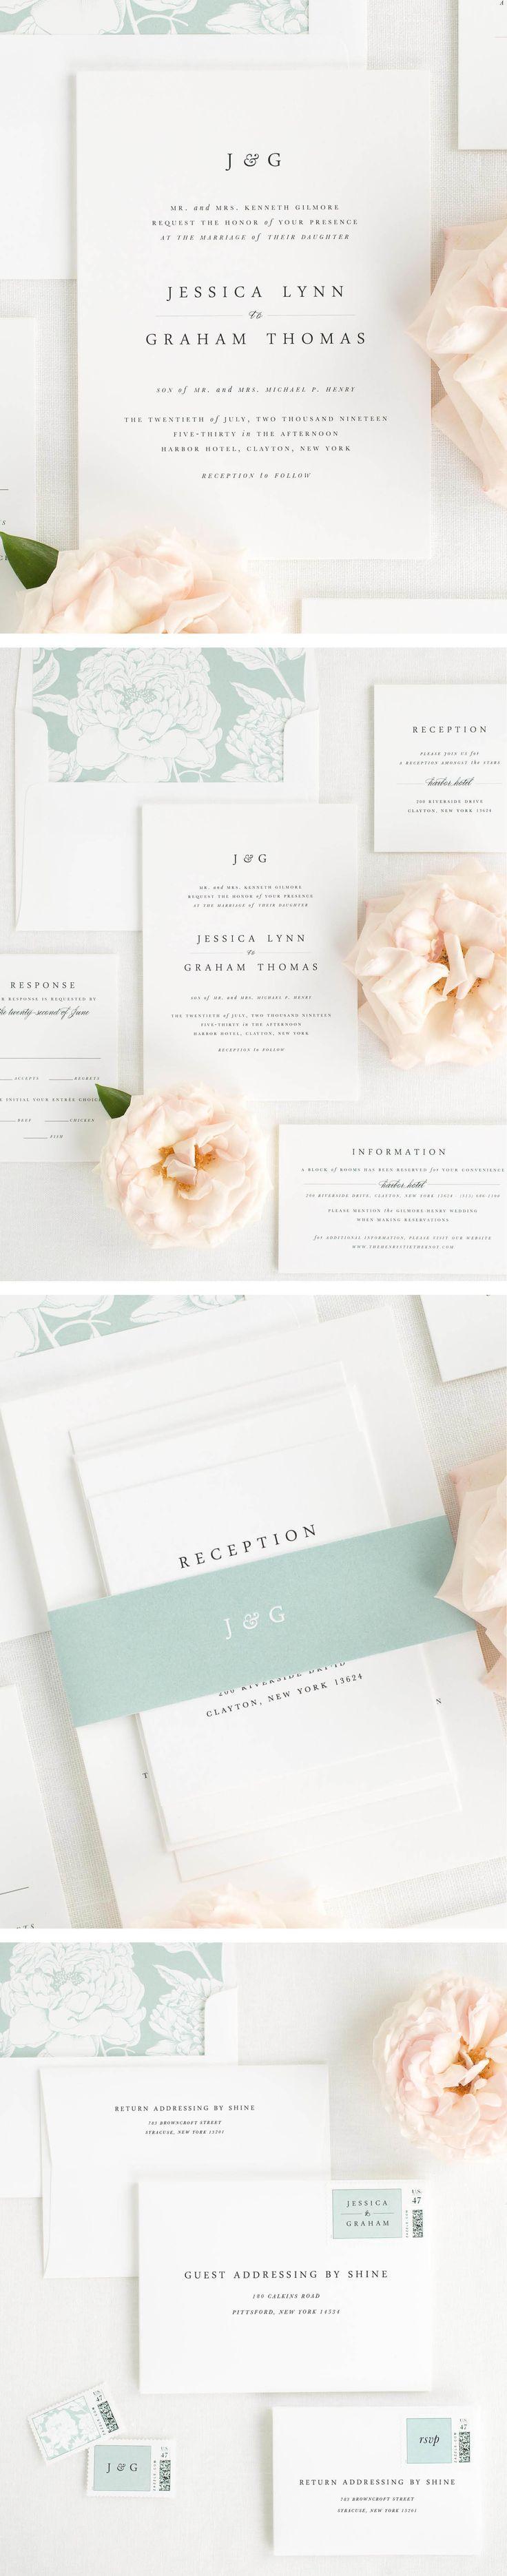 826 best shine wedding invitations images on pinterest